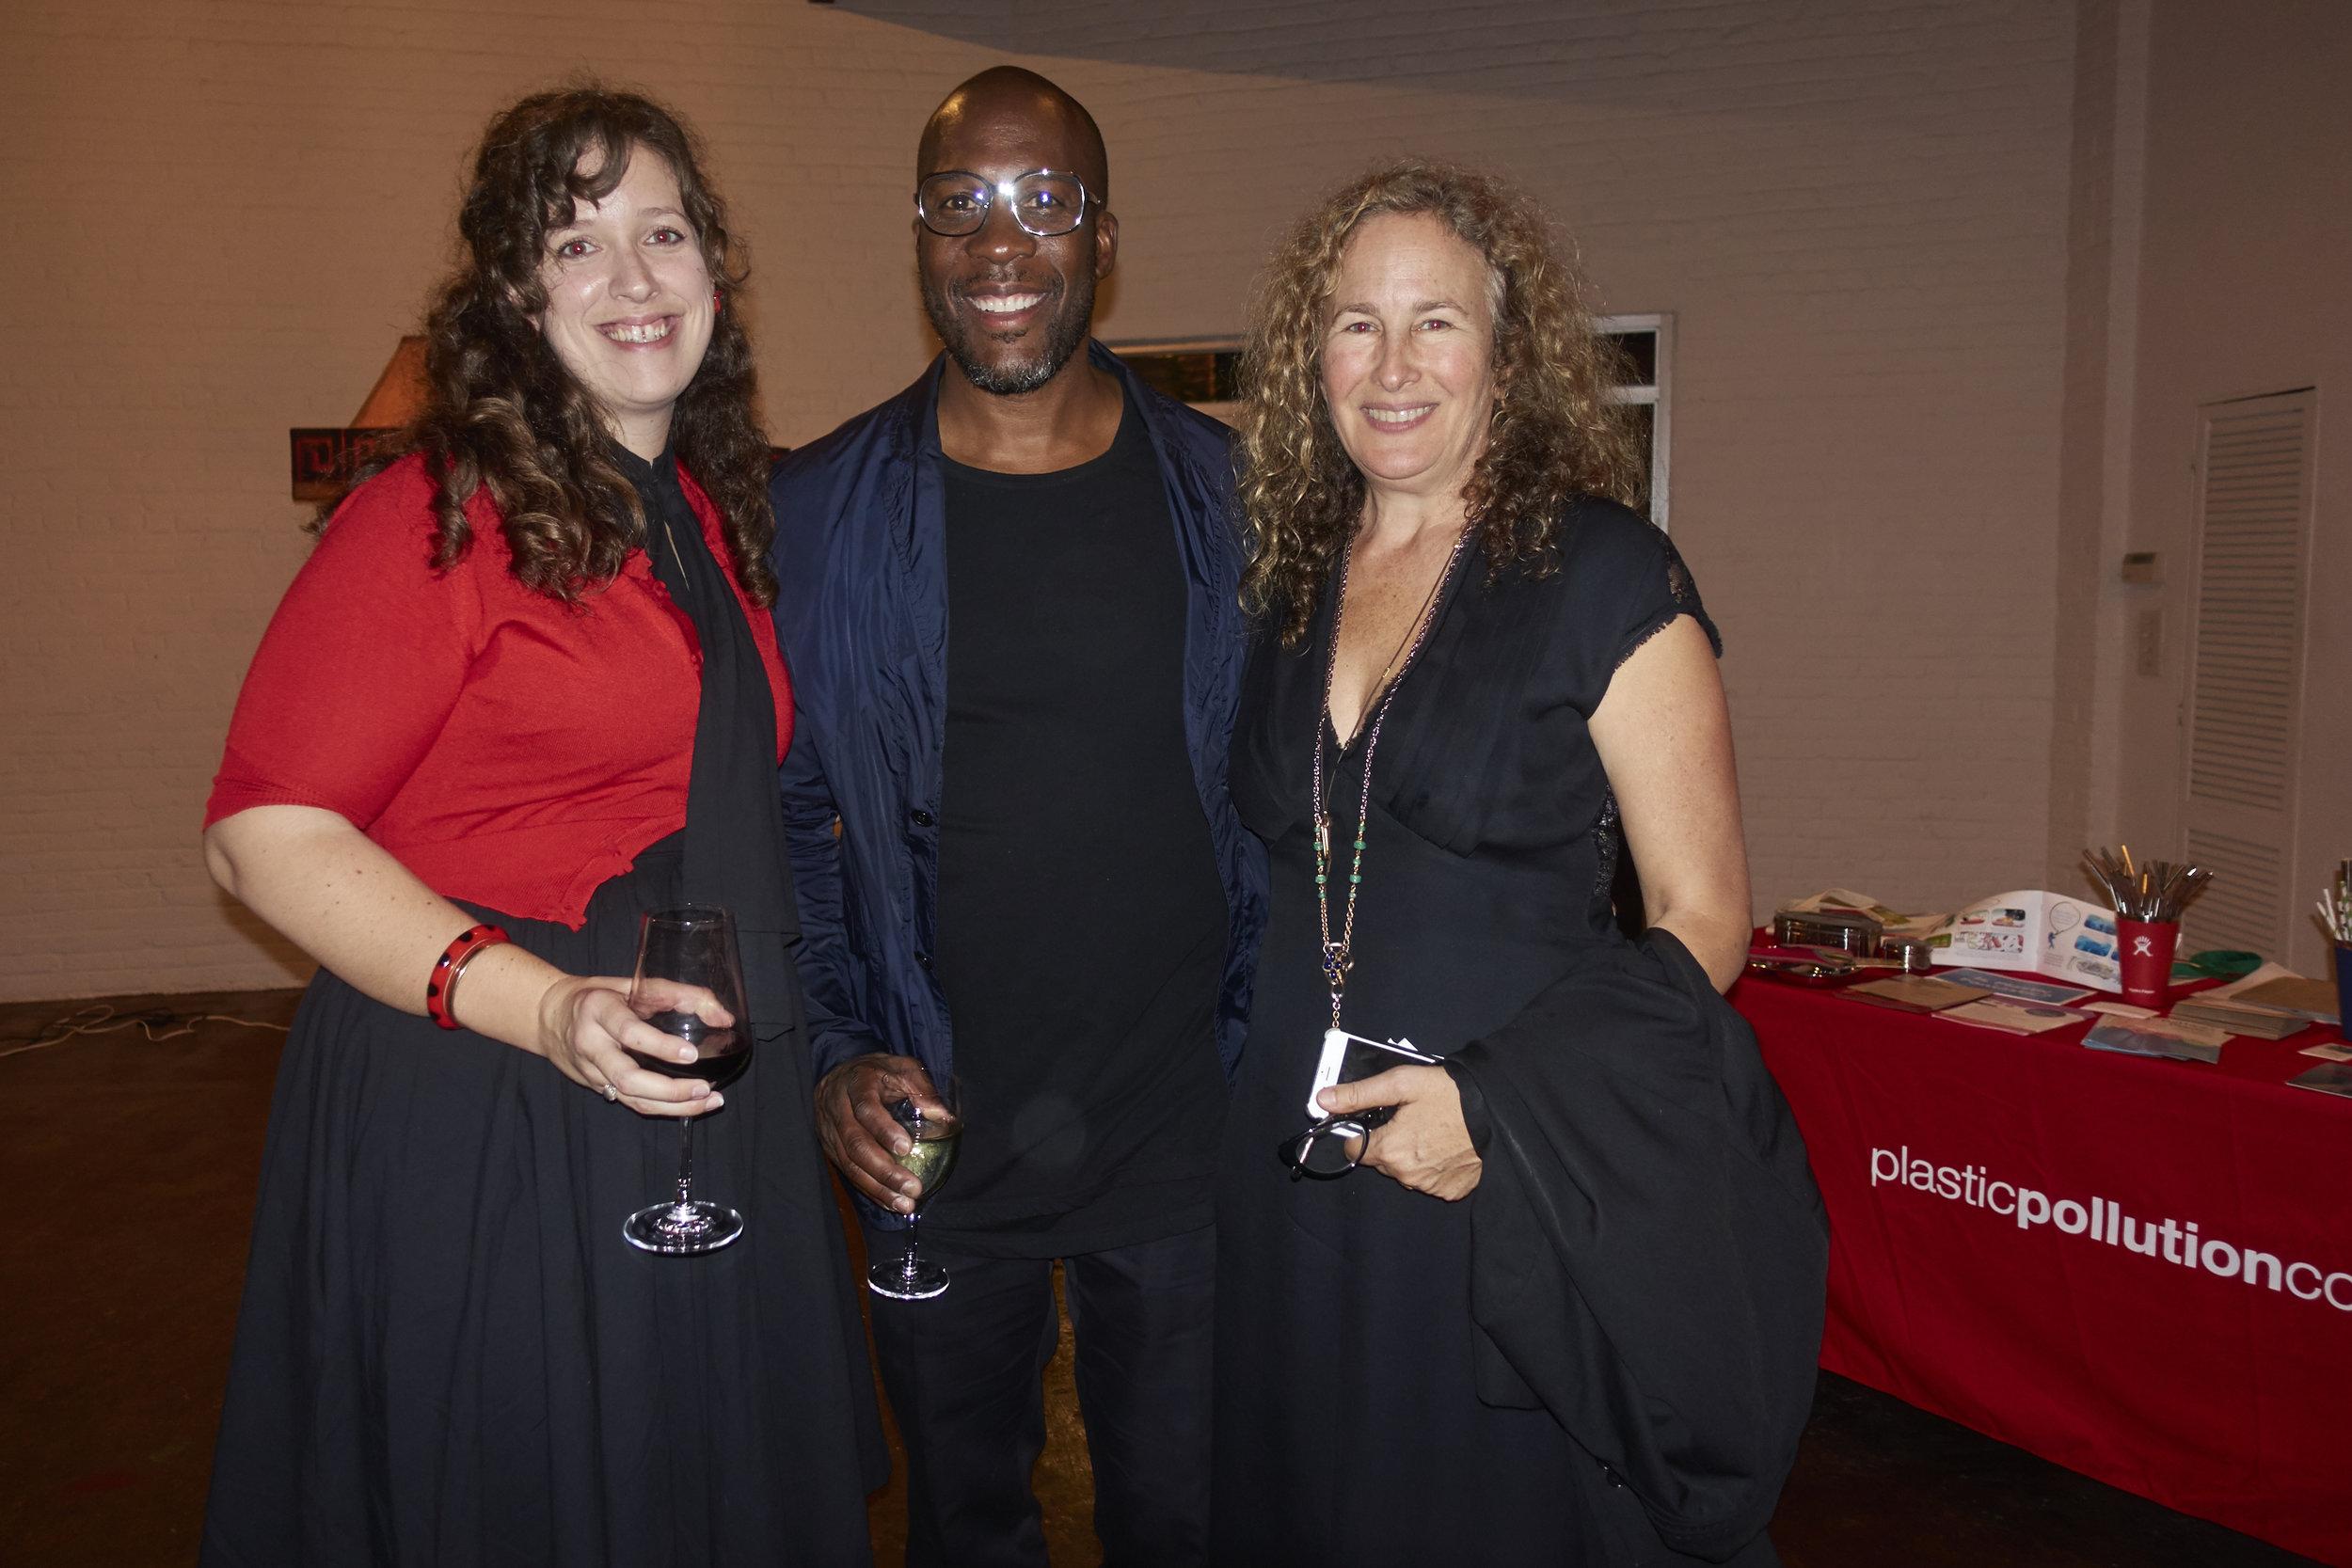 Jane Patton, Marquis Stillwell, and Dianna Cohen. Photo by  @lyndachurilla